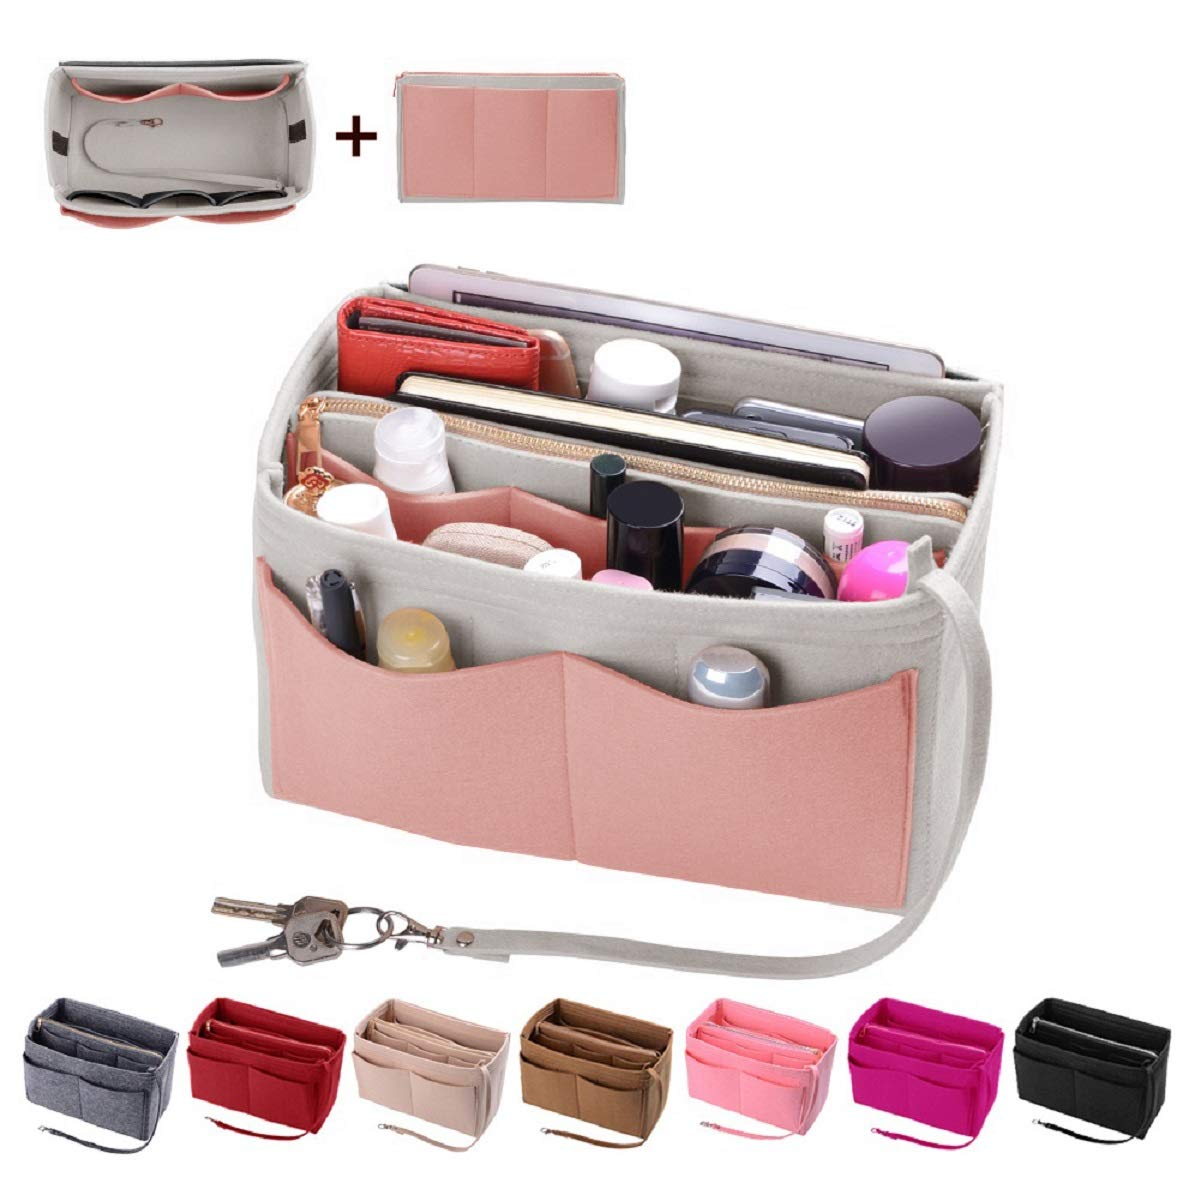 Purse Organizer Insert, Felt Bag organizer with zipper, Handbag & Tote Shaper, Fit LV Speedy, Neverfull, Longchamp, Tote (X-Large, White,Brush Pink and Grey)